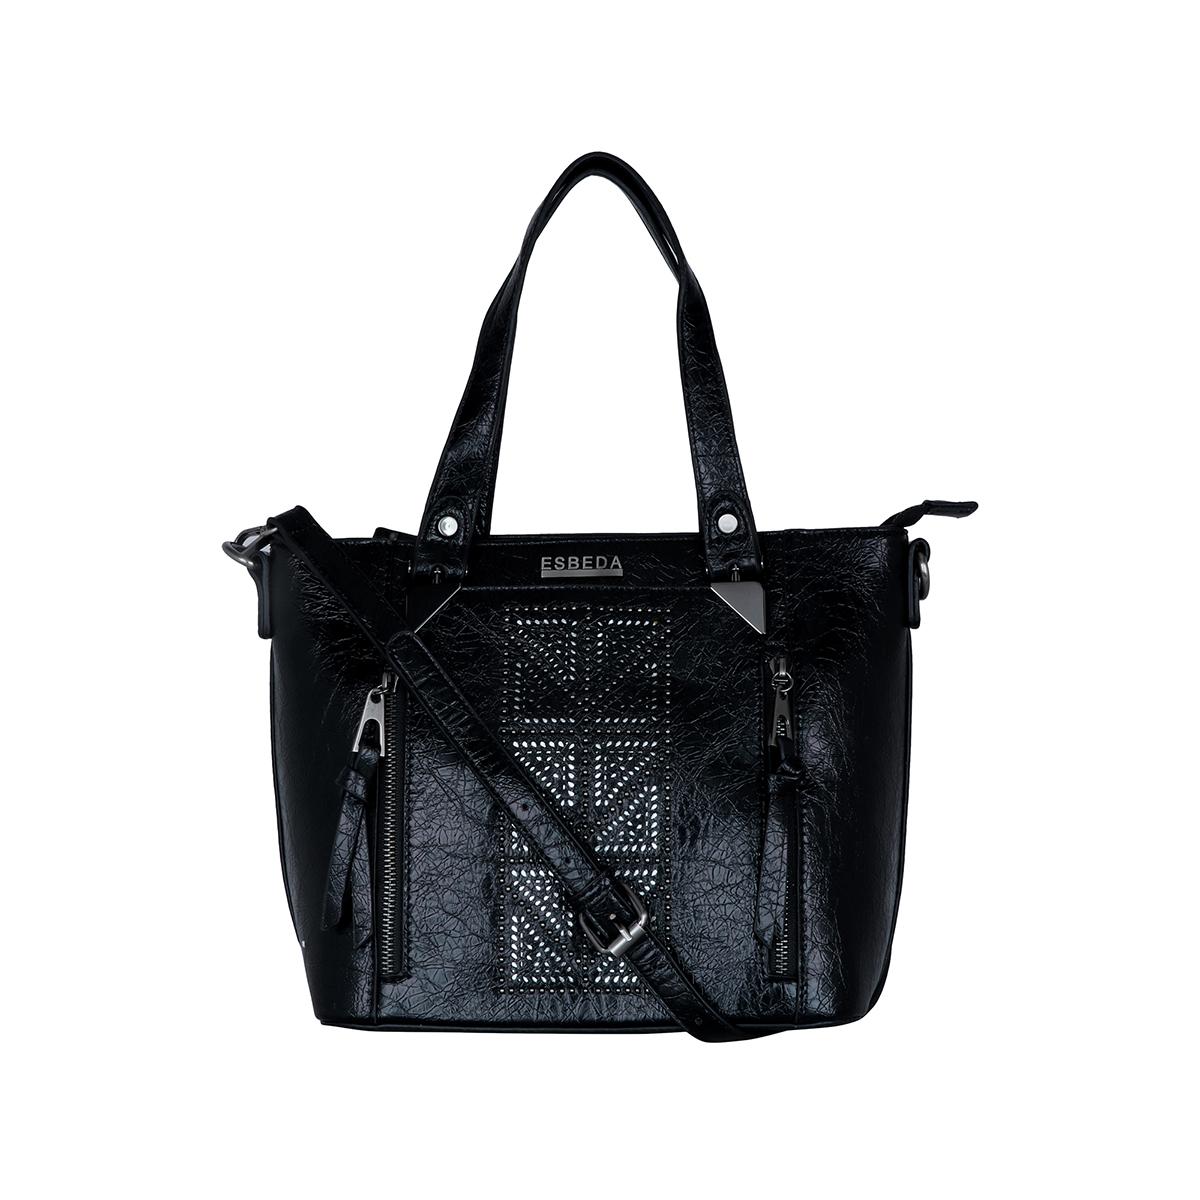 ESBEDA | ESBEDA Black Colour Antique Beaded Stone Handbag For Women